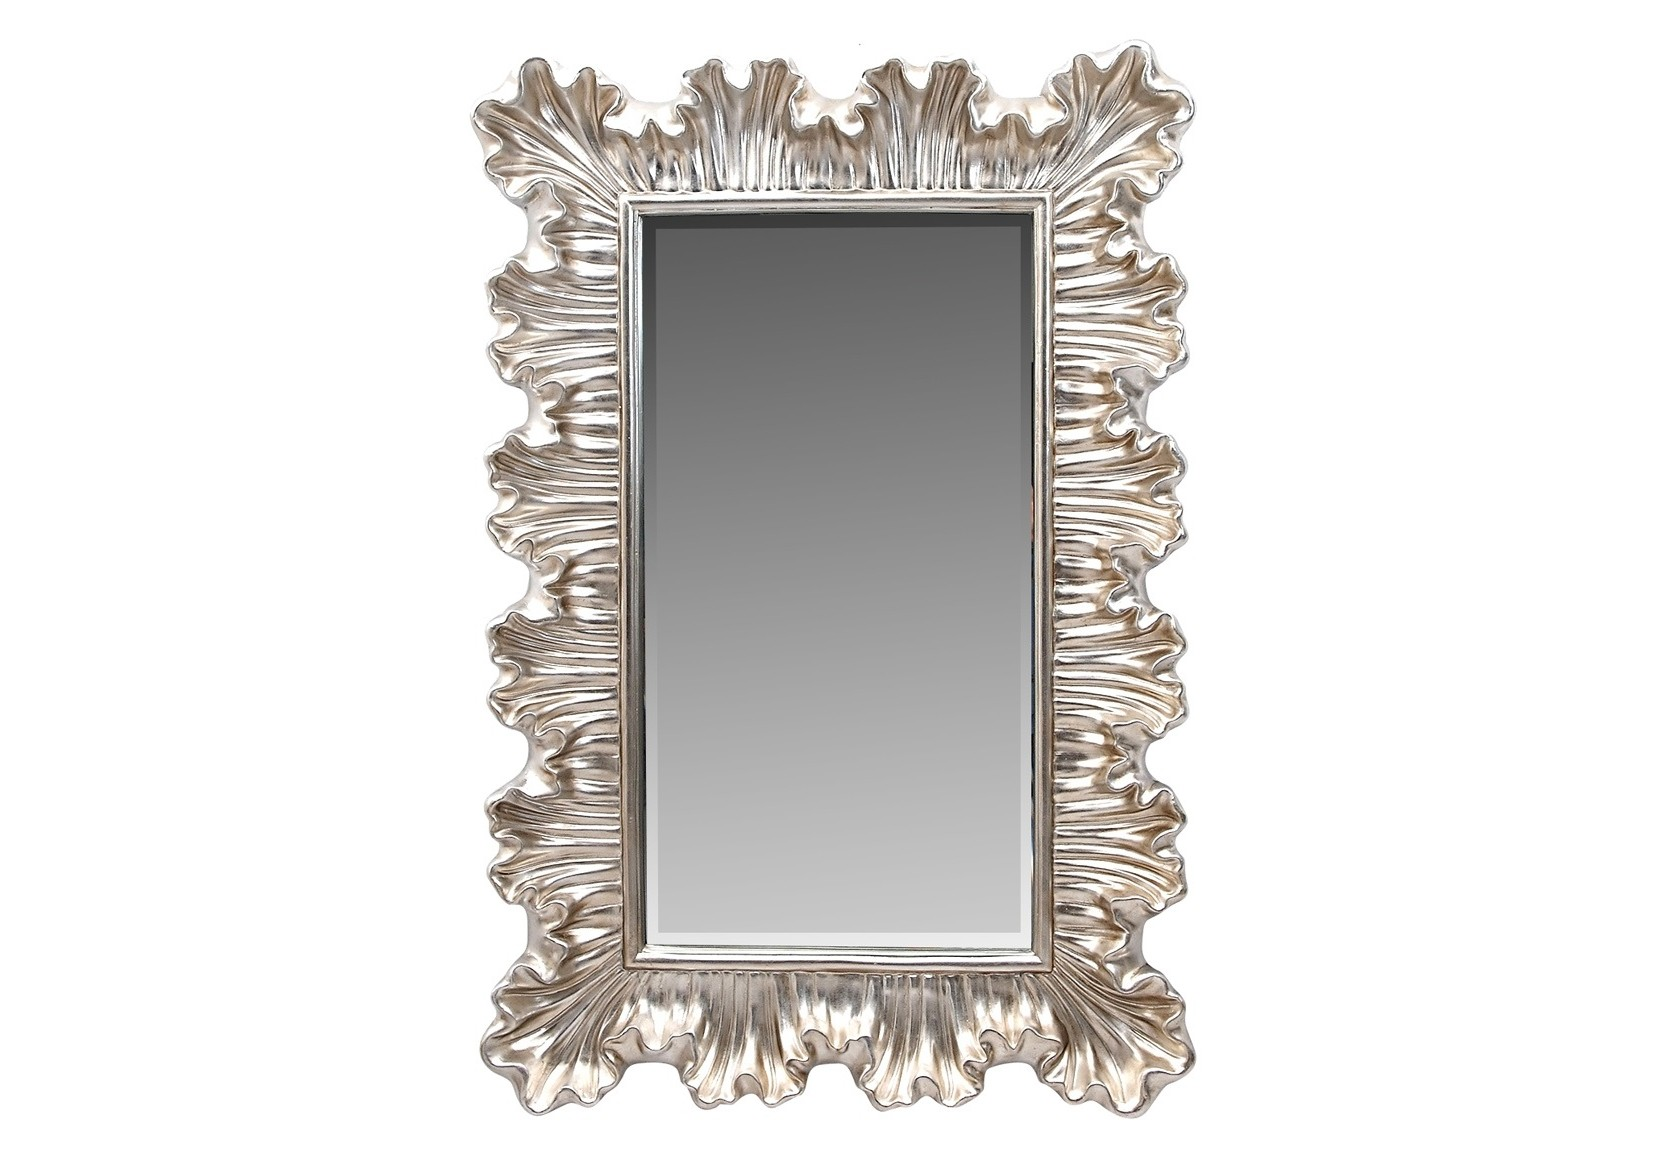 Настенное зеркалоНастенные зеркала<br><br><br>Material: Полистоун<br>Length см: None<br>Width см: 82<br>Depth см: 7<br>Height см: 122